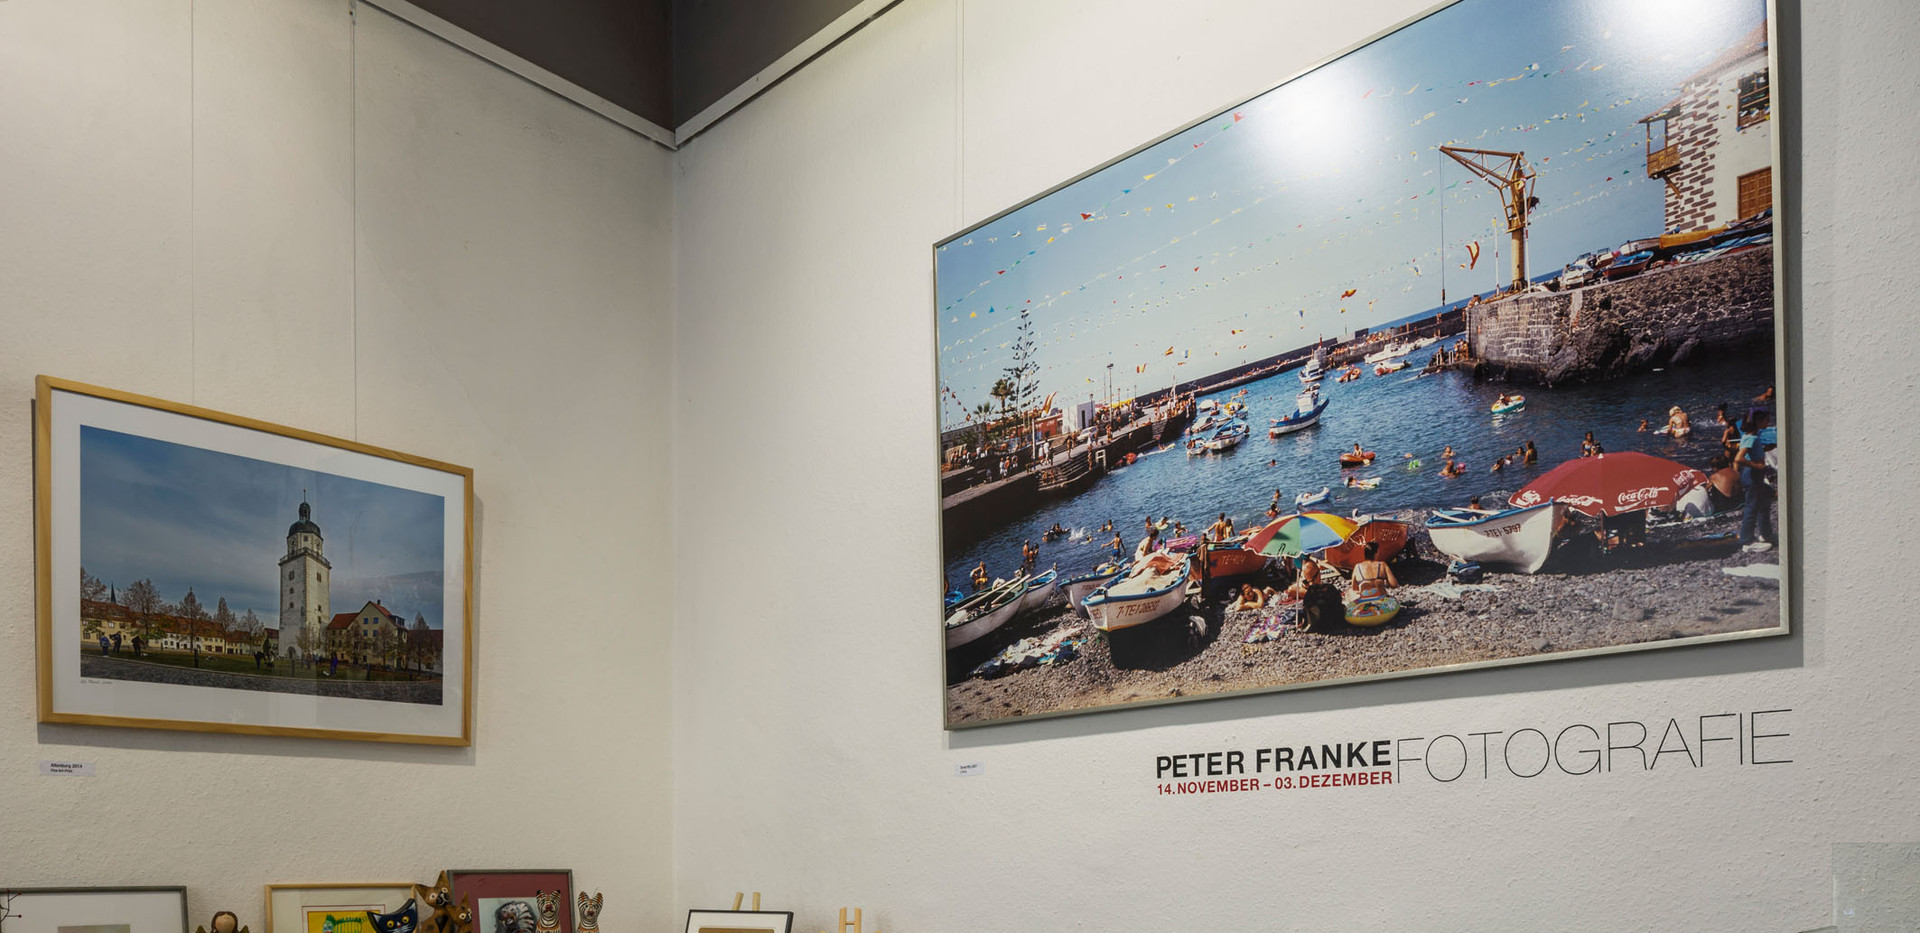 Peter Franke_MG_7788.jpg